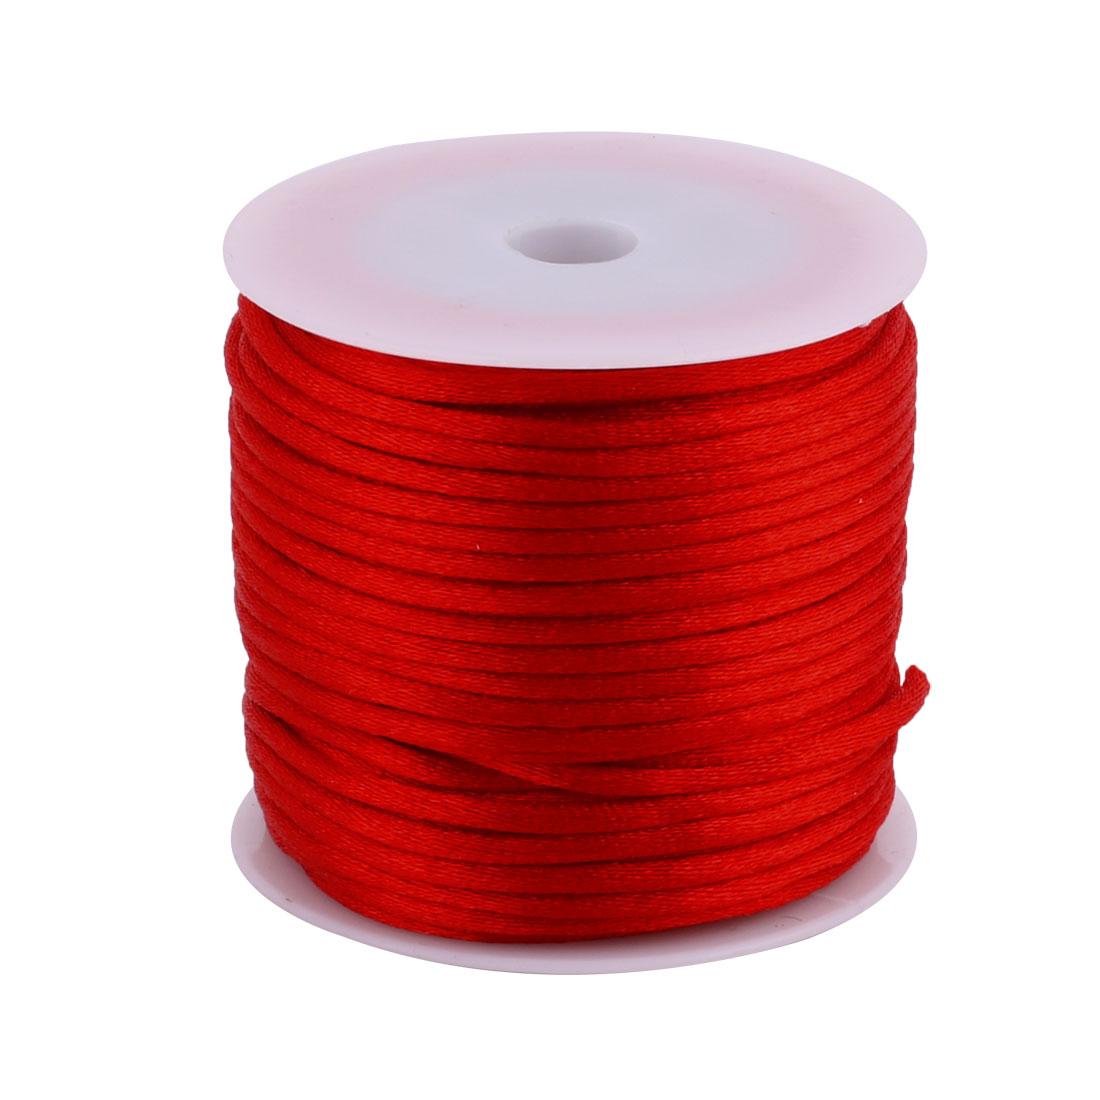 Lady Nylon Handcraft DIY Necklace Bracelet Beading Cord Red 2.5mm Dia 29.5 Yards